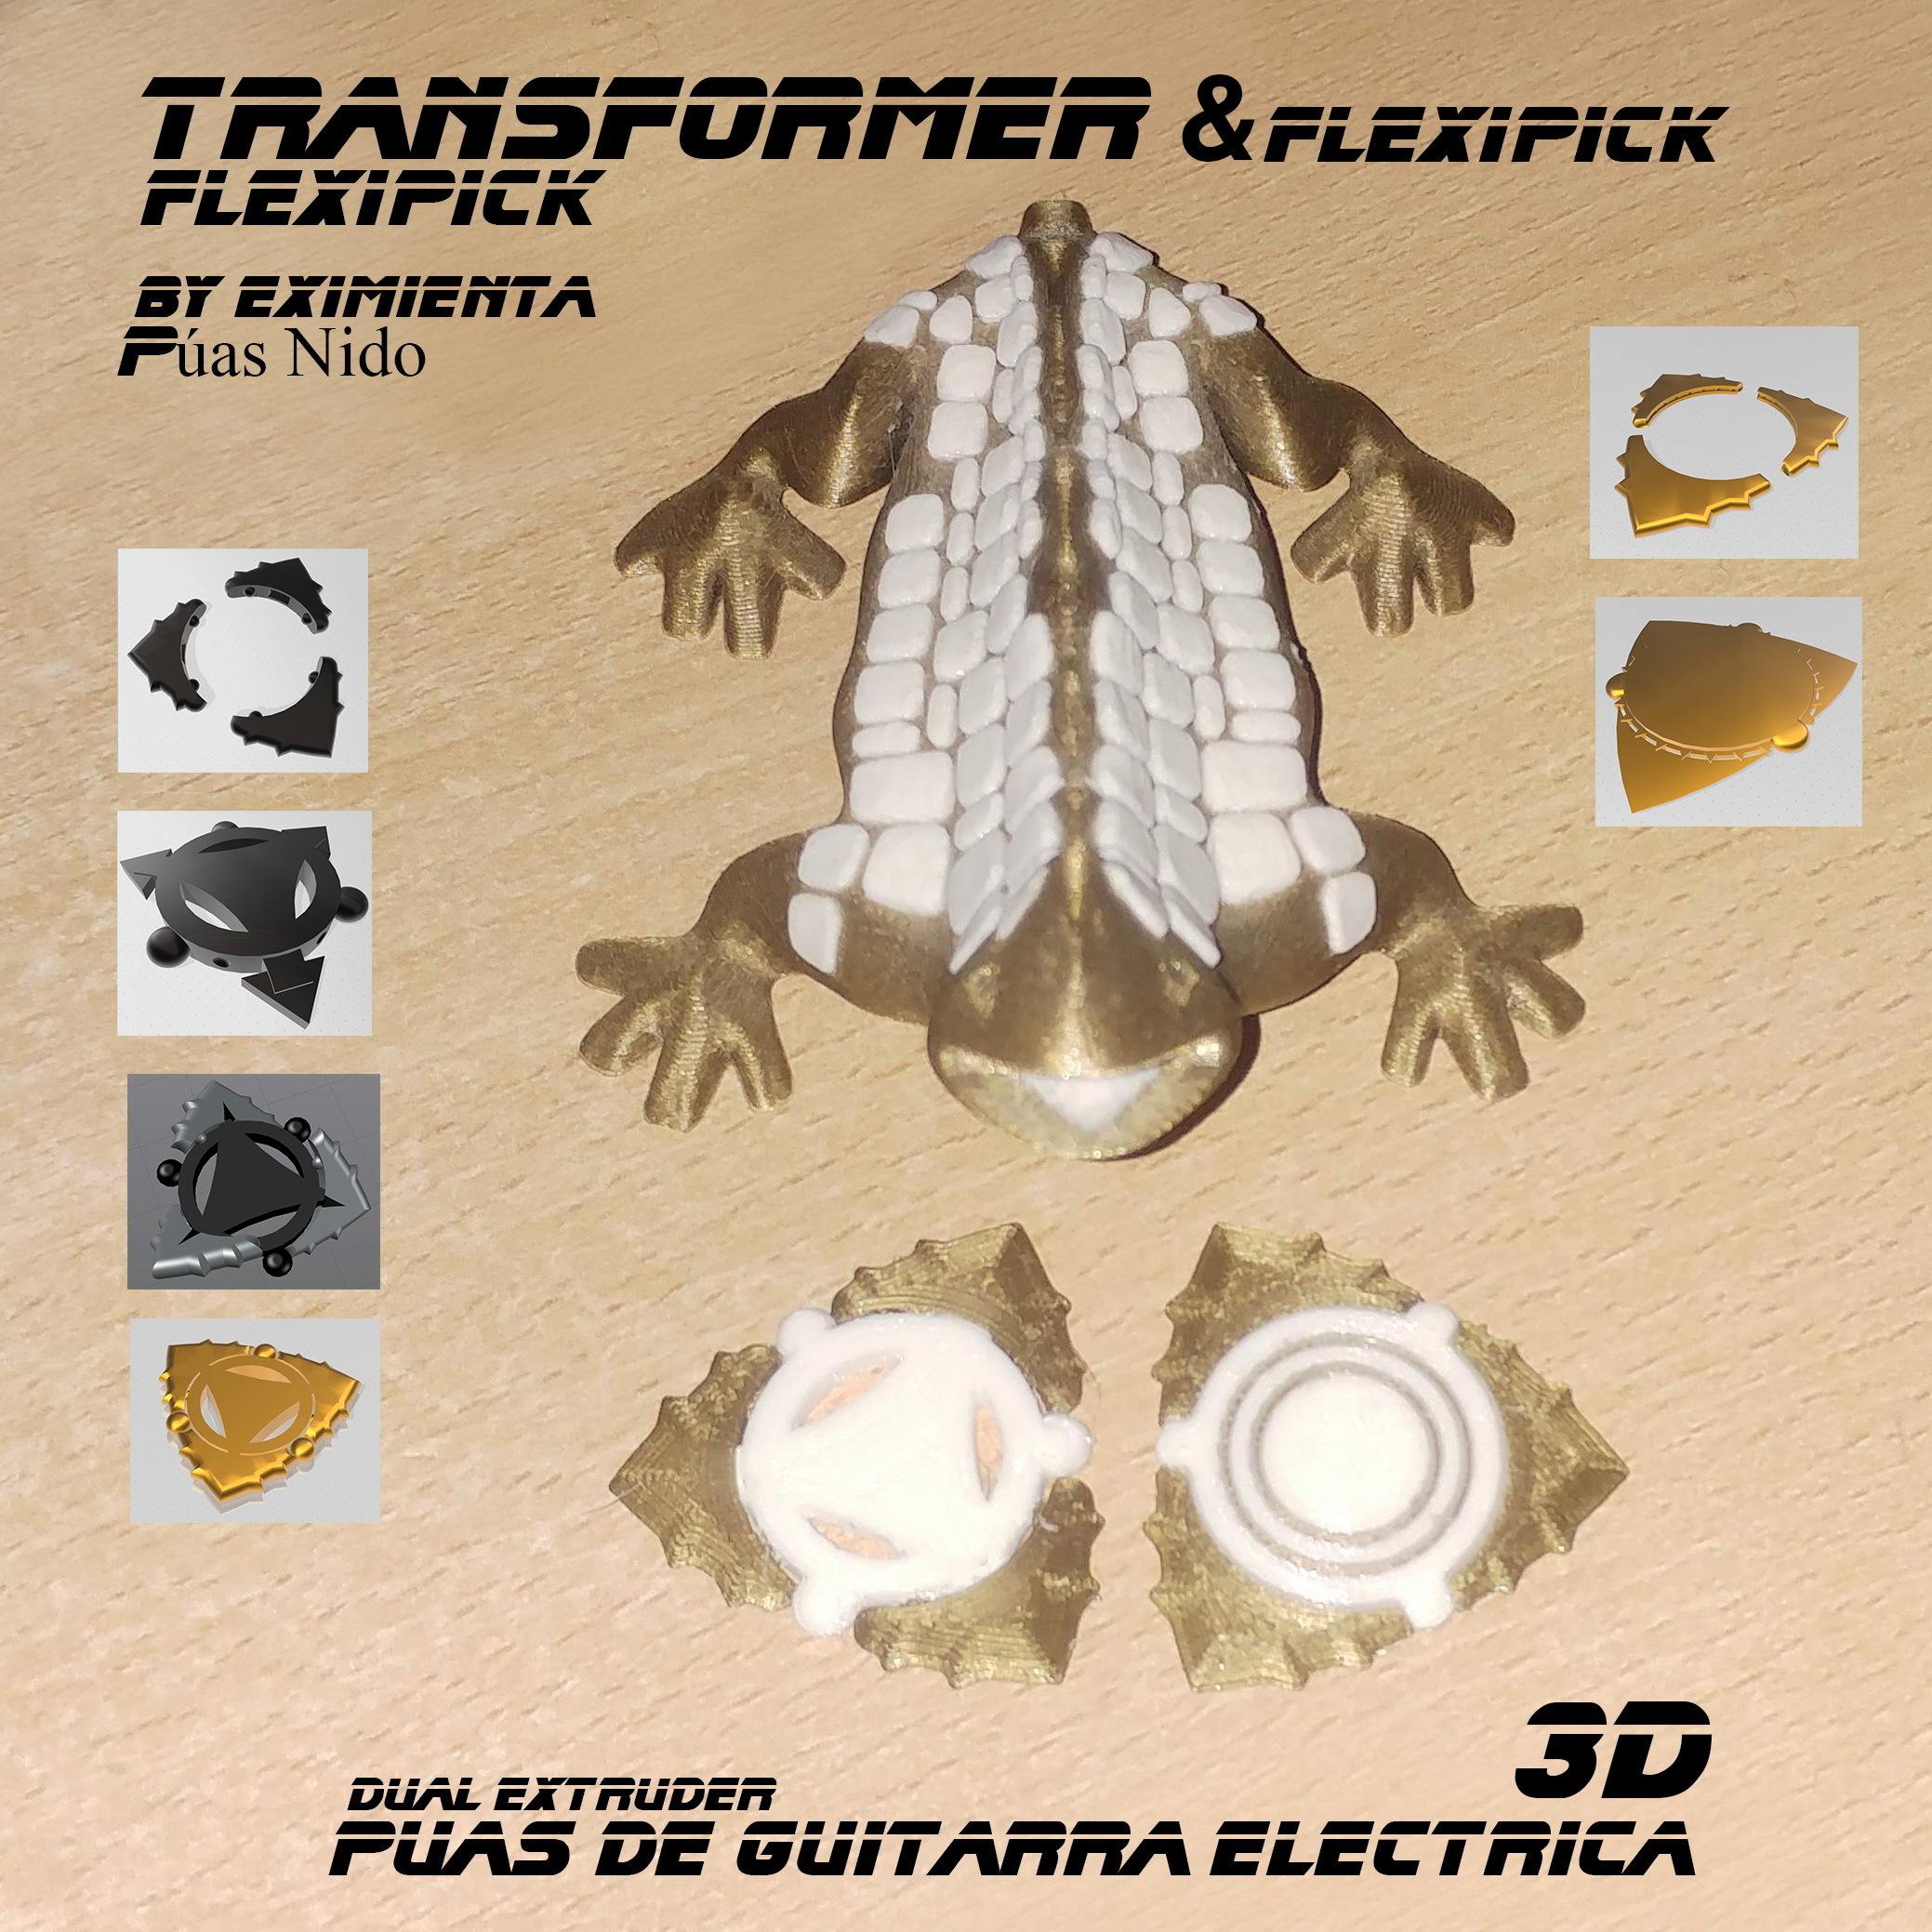 TRANSFORMER 300720 flexipick y Transformer Flexipick.jpg Download free 3MF file FLEXIPICK TRANSFORMER electric guitar pick • 3D printable design, carleslluisar